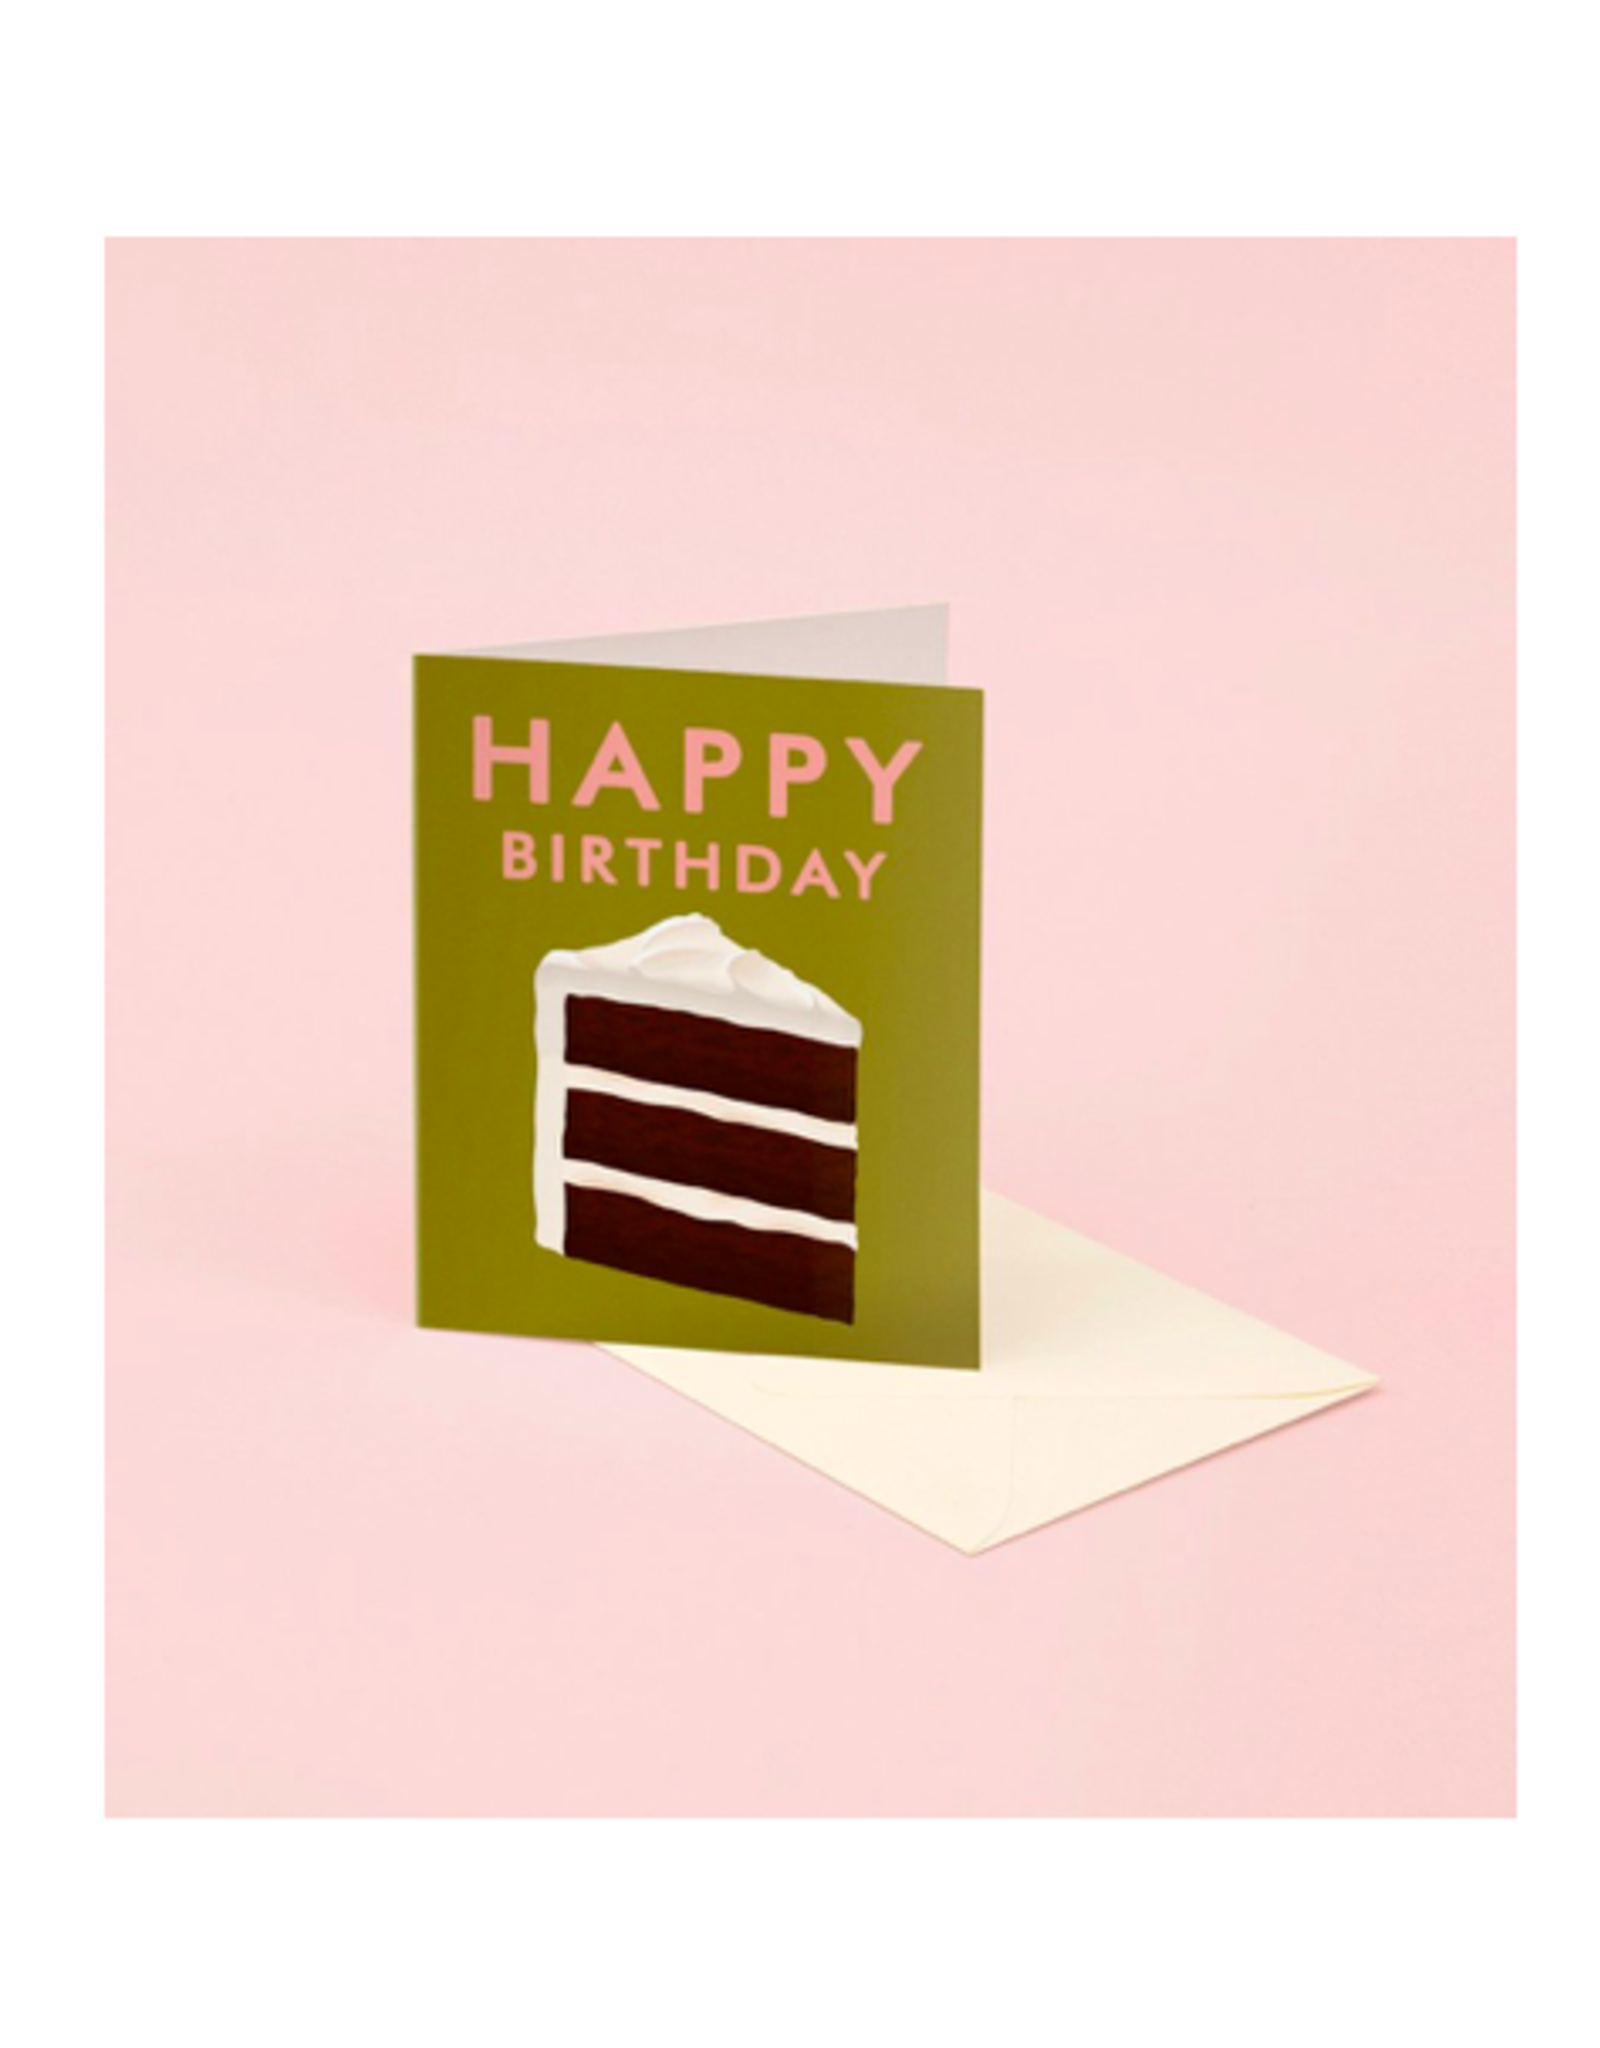 CAP - Card/Slice of Cake, Birthday